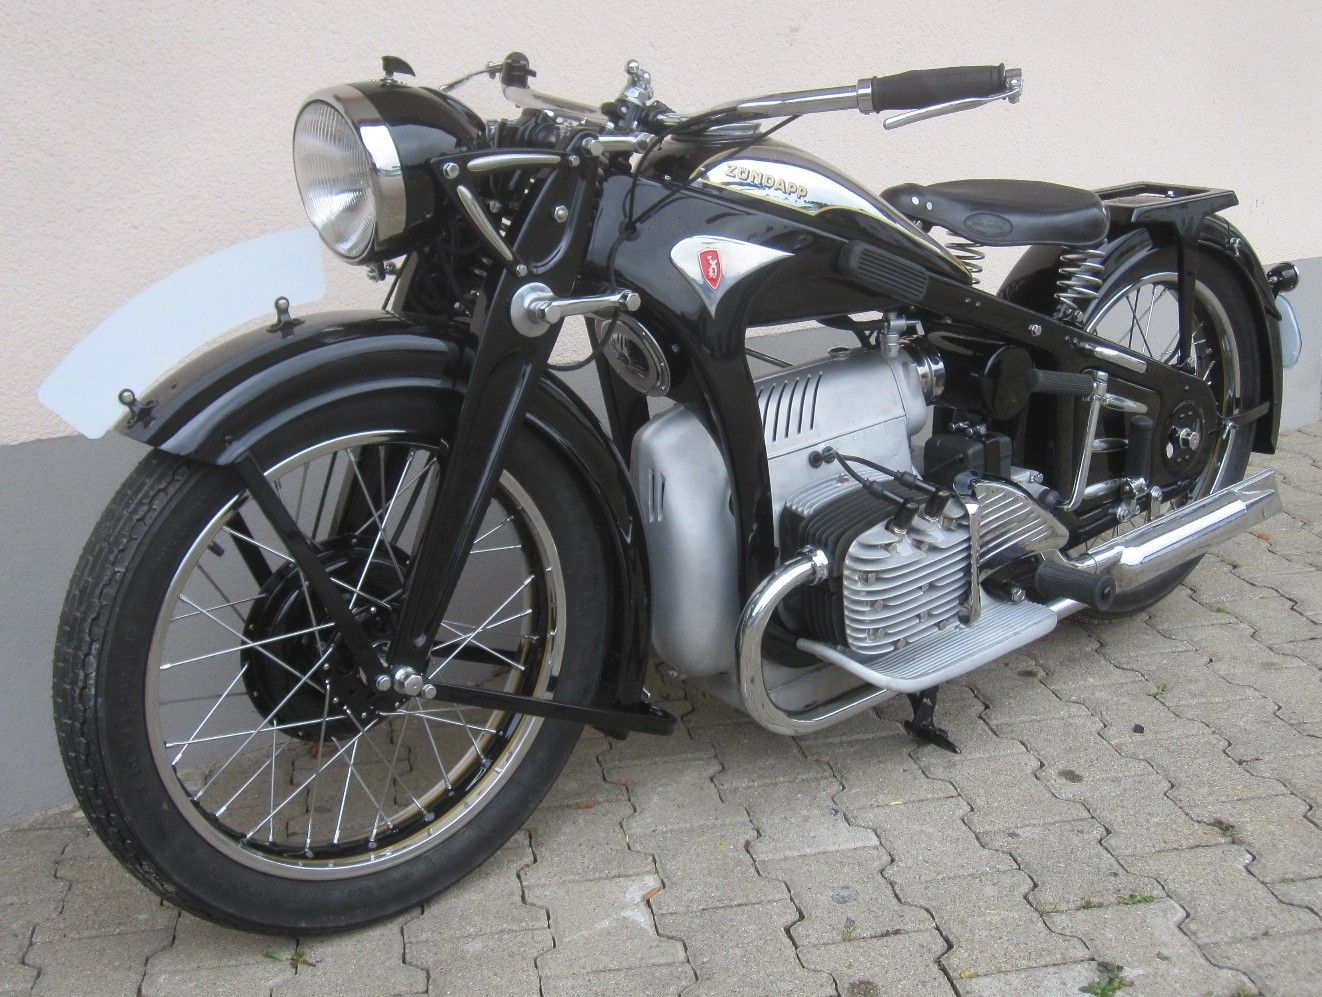 Zündapp motociclette 1921-1984